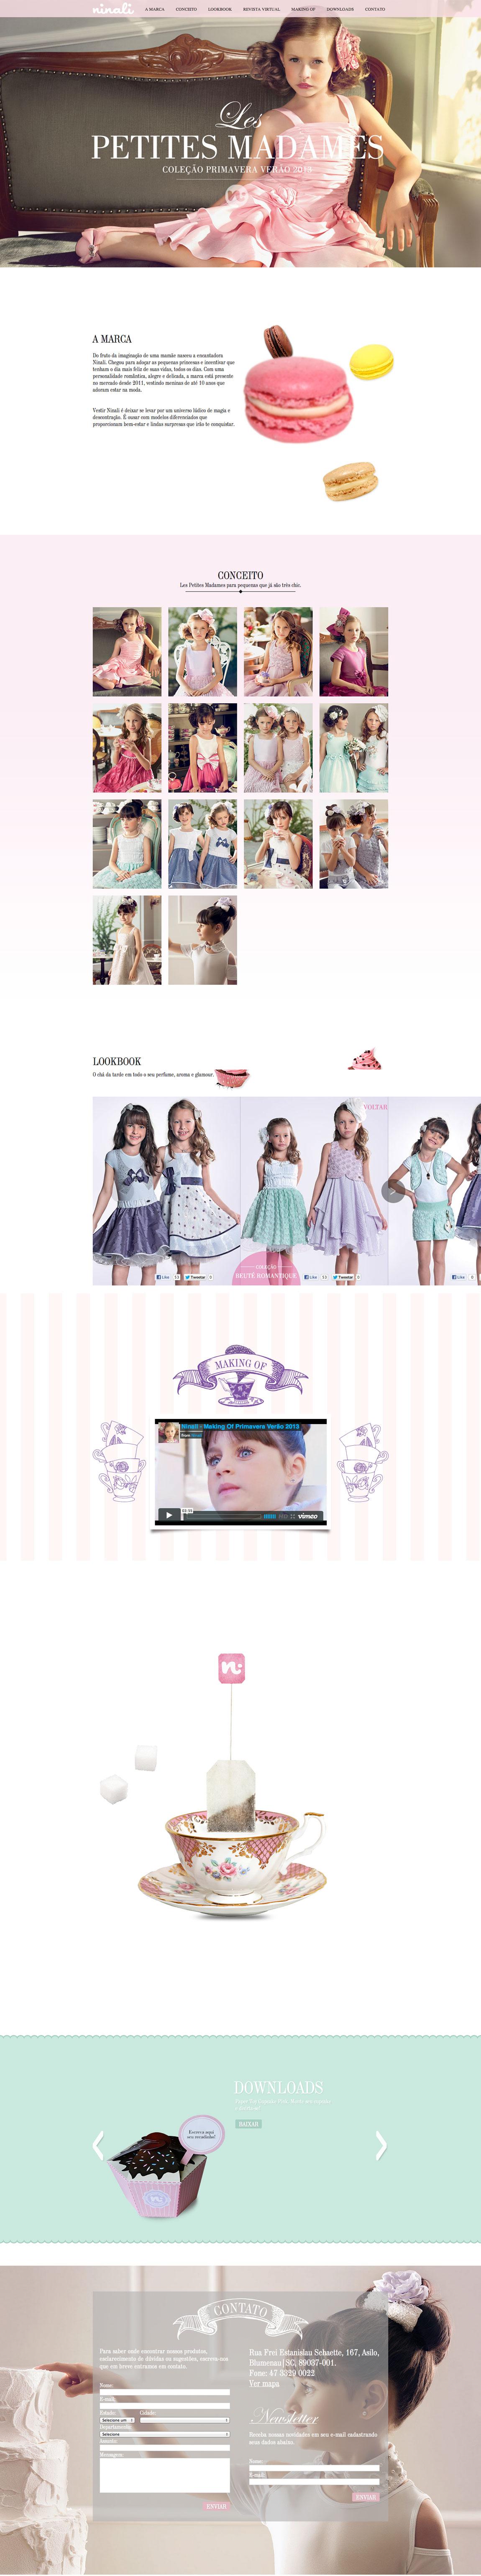 Ninali – Primavera Verão 2013 Website Screenshot